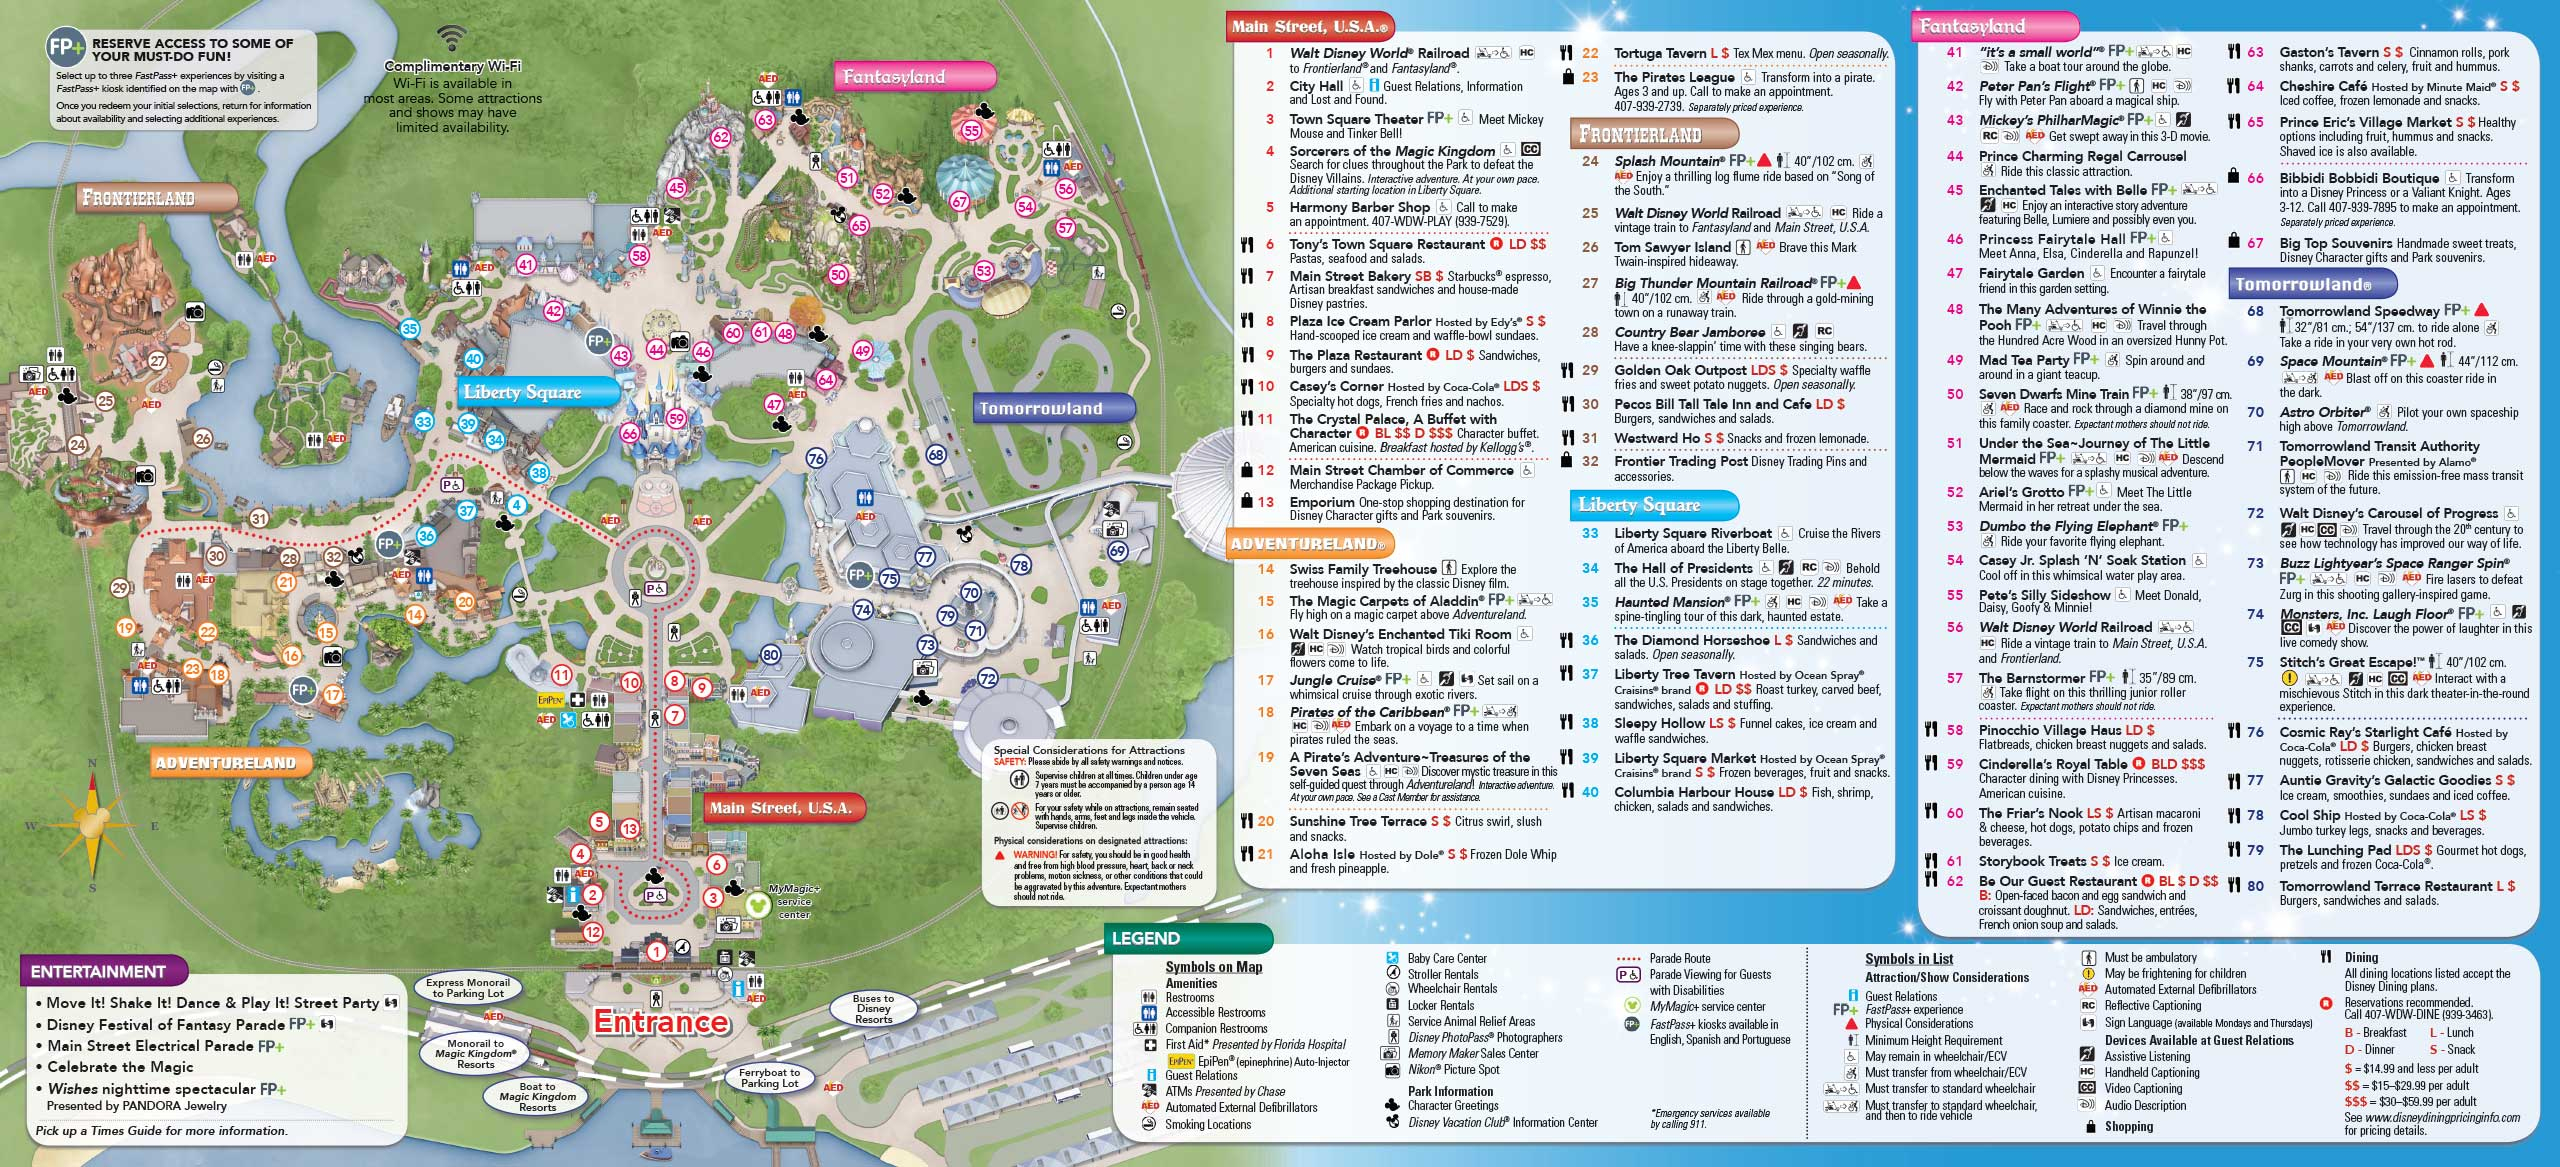 Disney World Theme Park Maps 2017 Google Map Disney World Orlando - Google Maps Orlando Florida